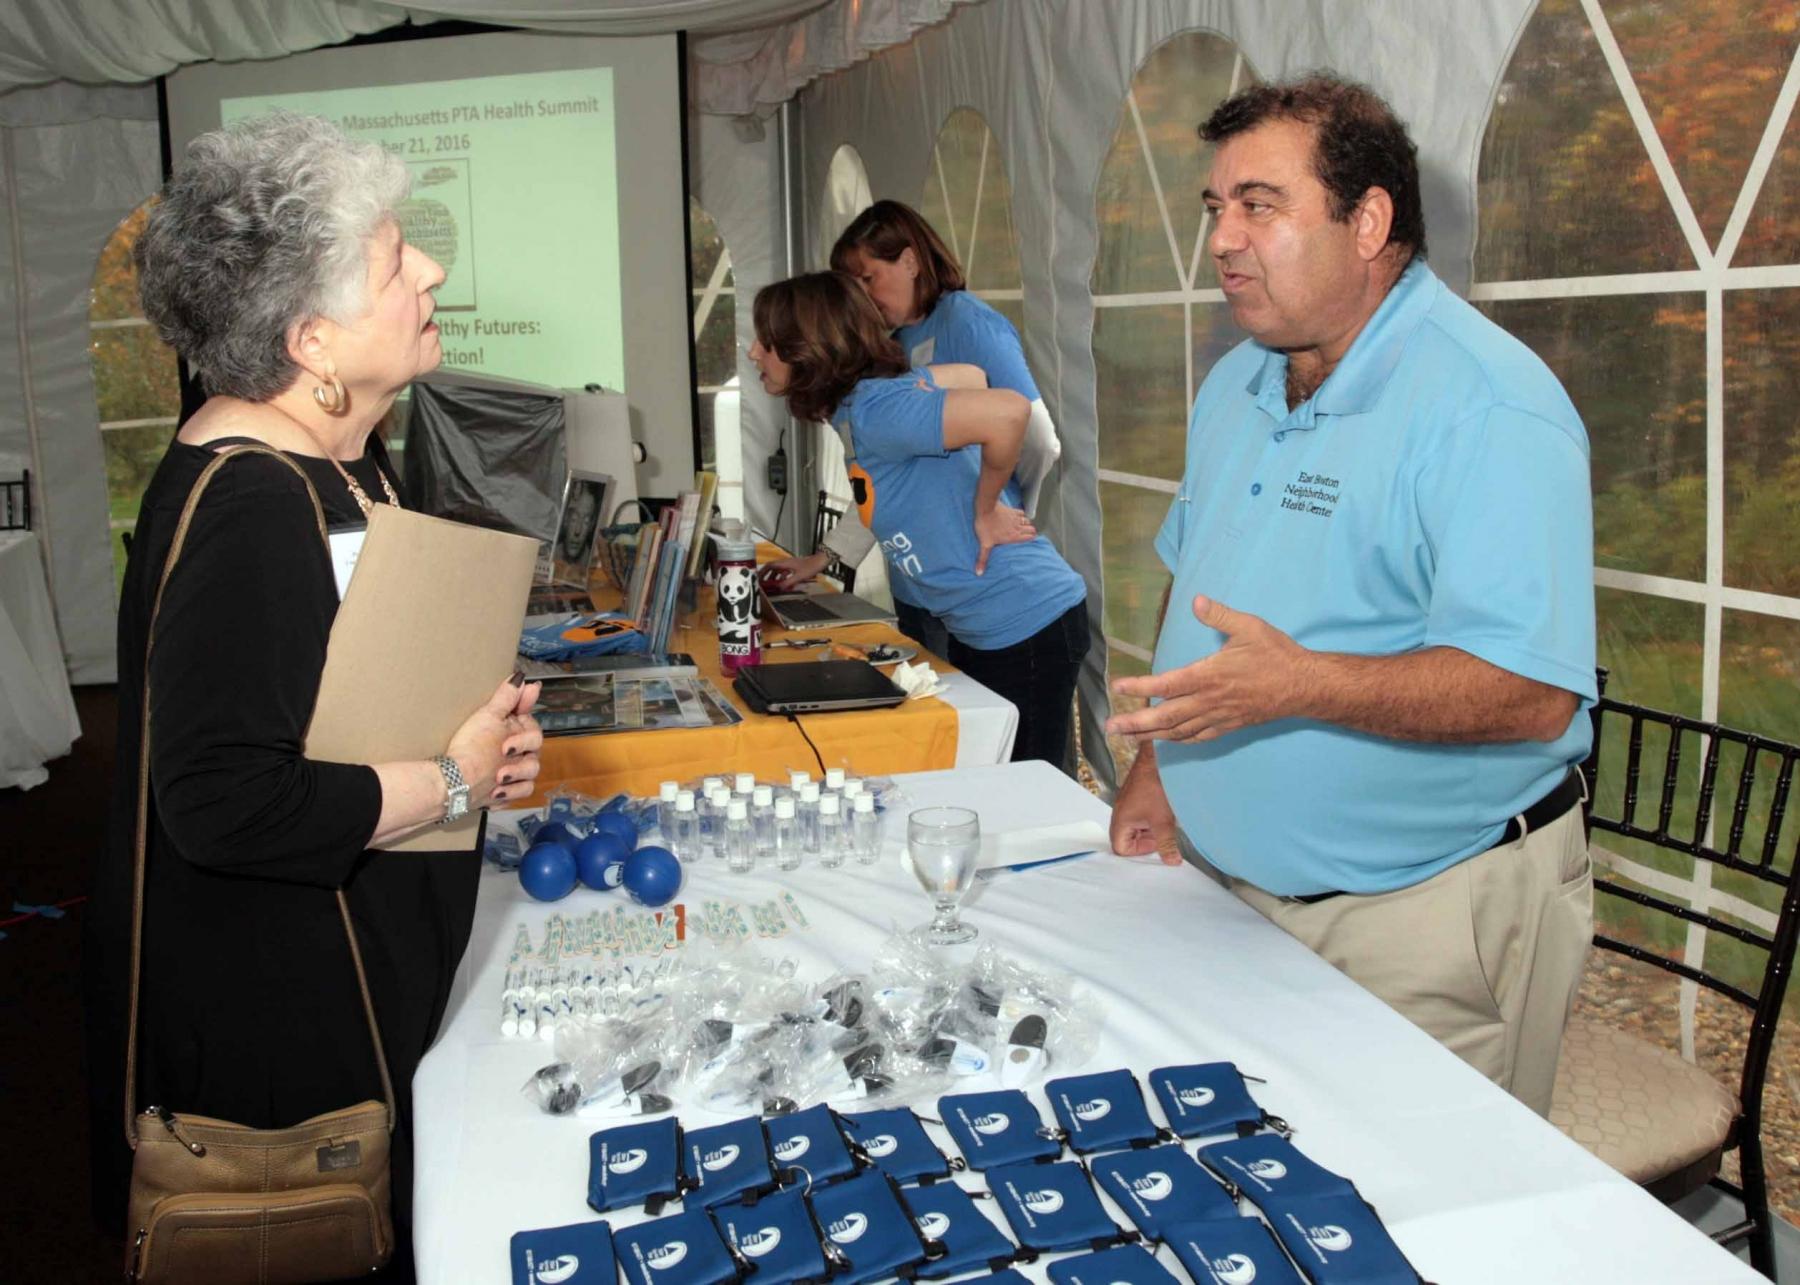 Mike Nicastro, East Boston Neighborhood Health Center - MA PTA Health Summit Vendors